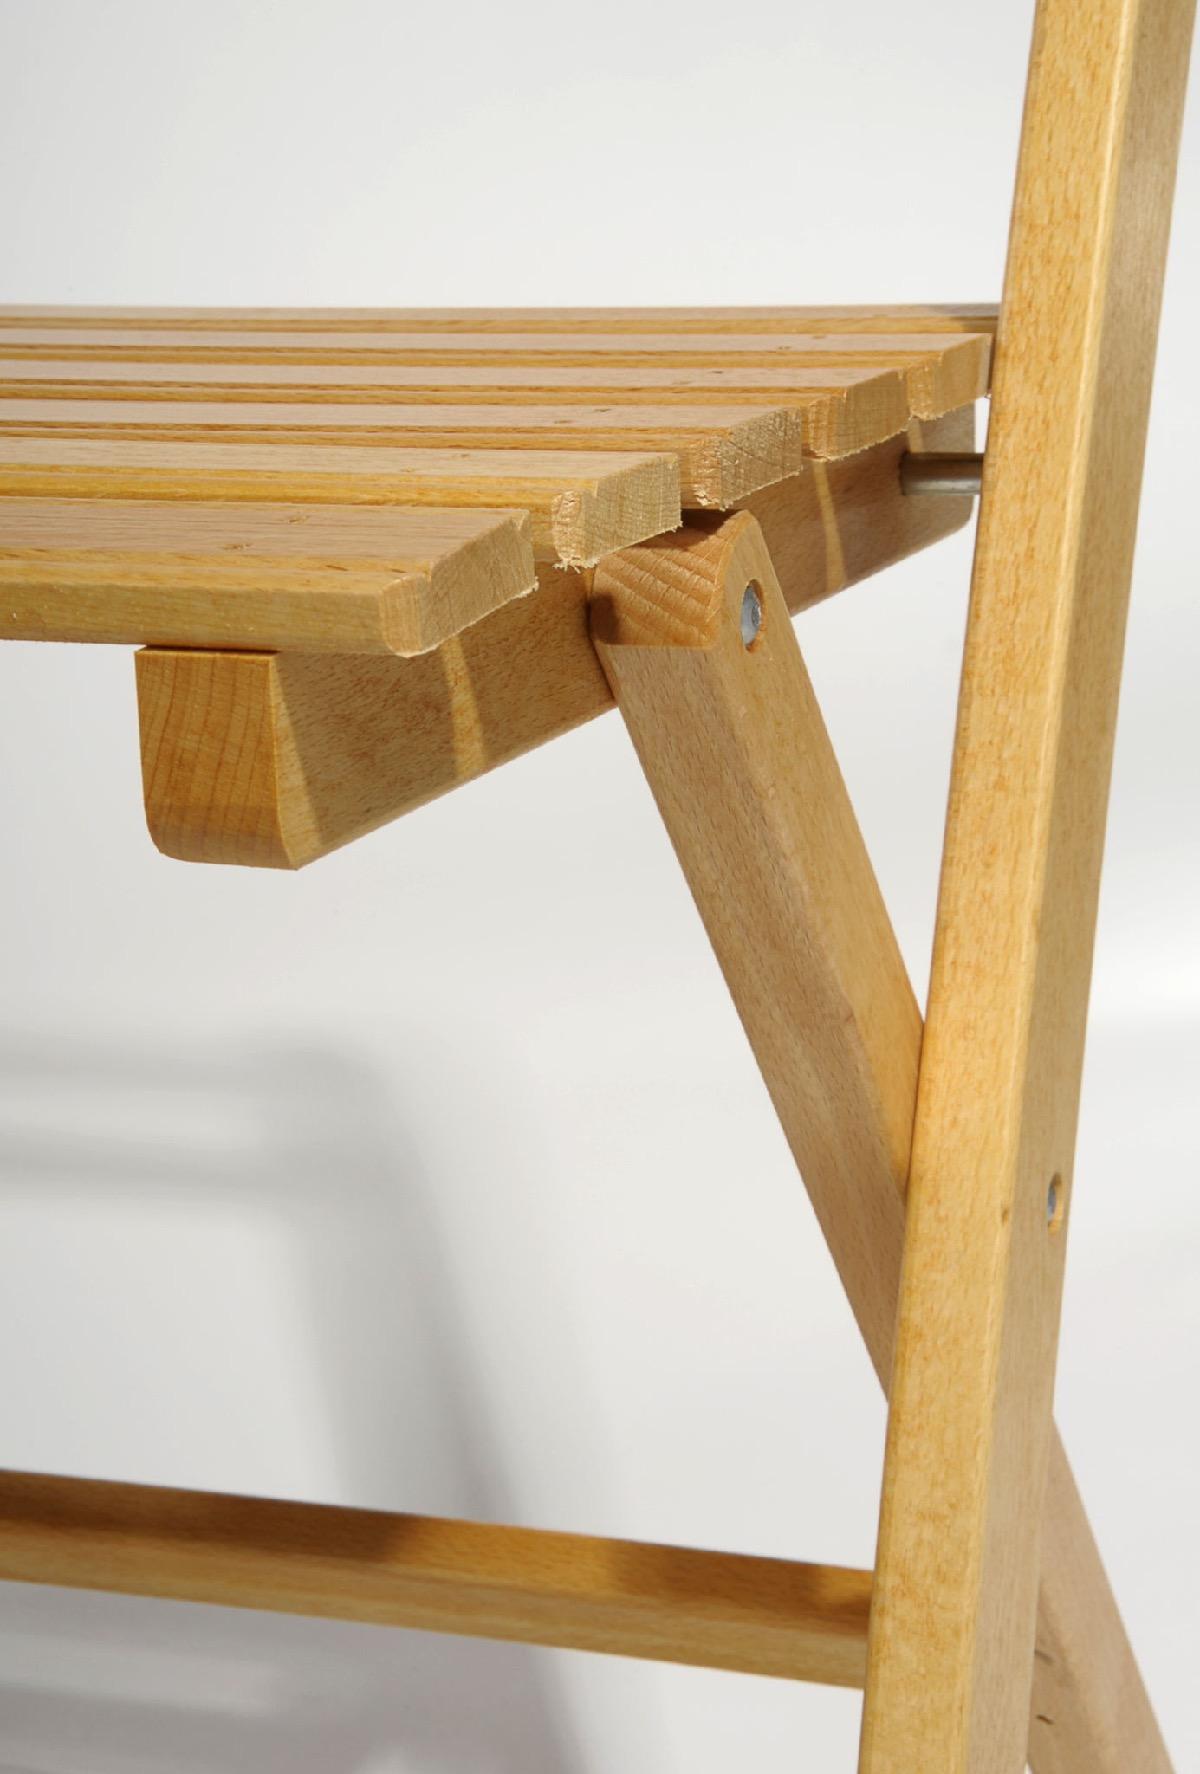 Fabrica sillas de madera valencia - Fabrica de sillas de madera ...